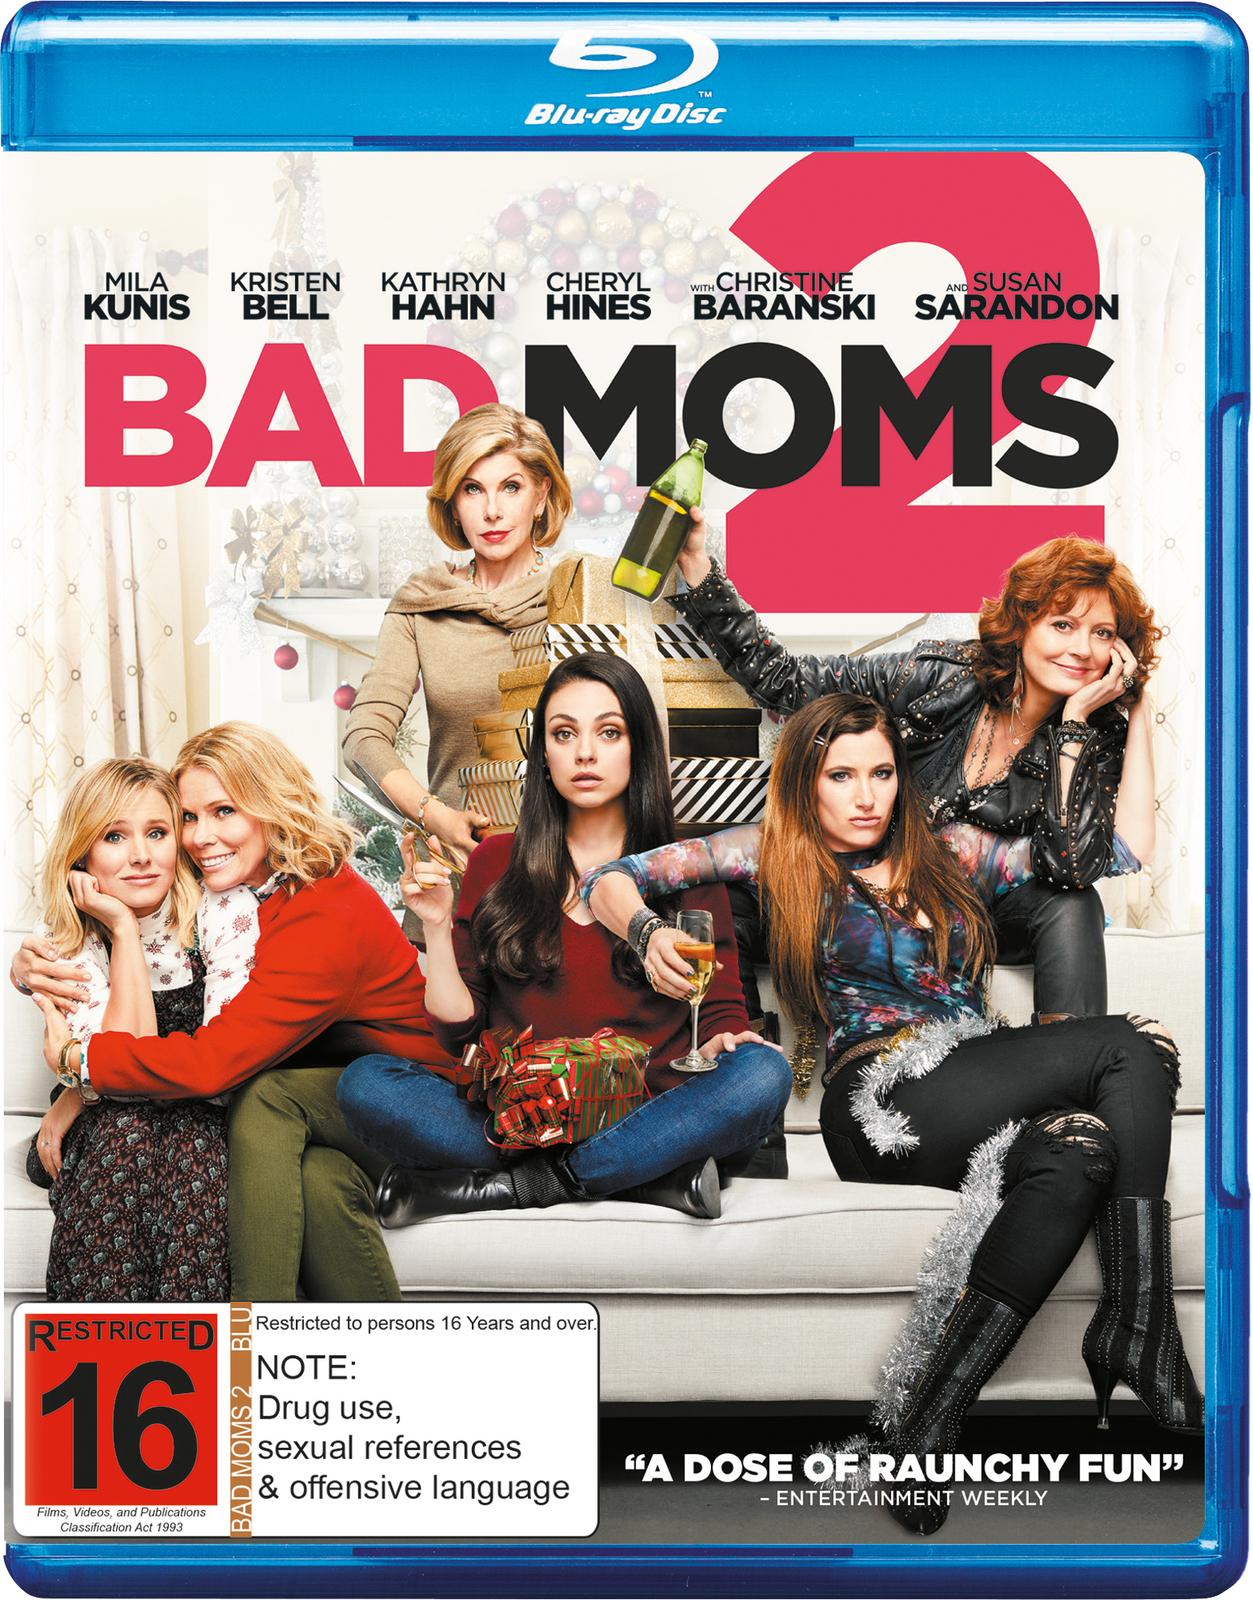 Bad Moms 2 on Blu-ray image